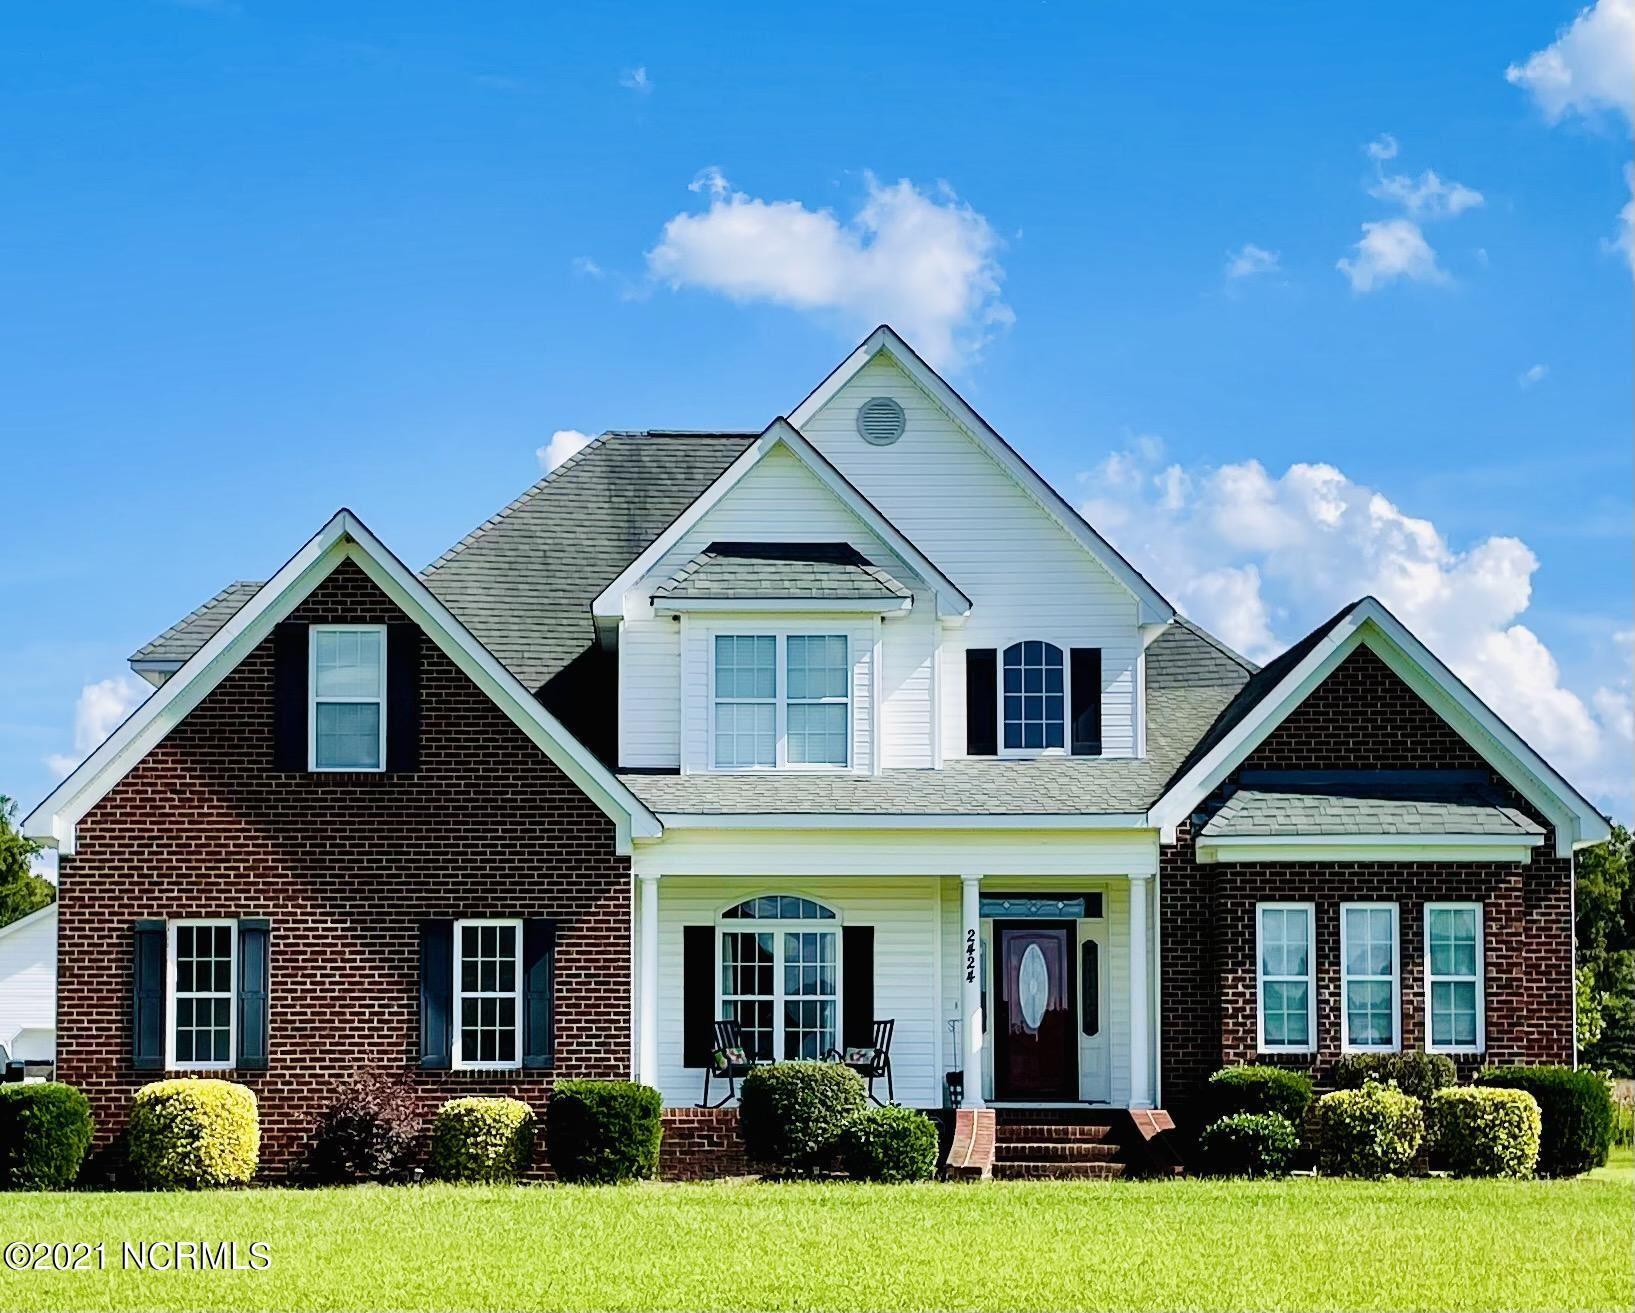 Photo of 2424 Wheaton Village Drive, Greenville, NC 27858 (MLS # 100285918)